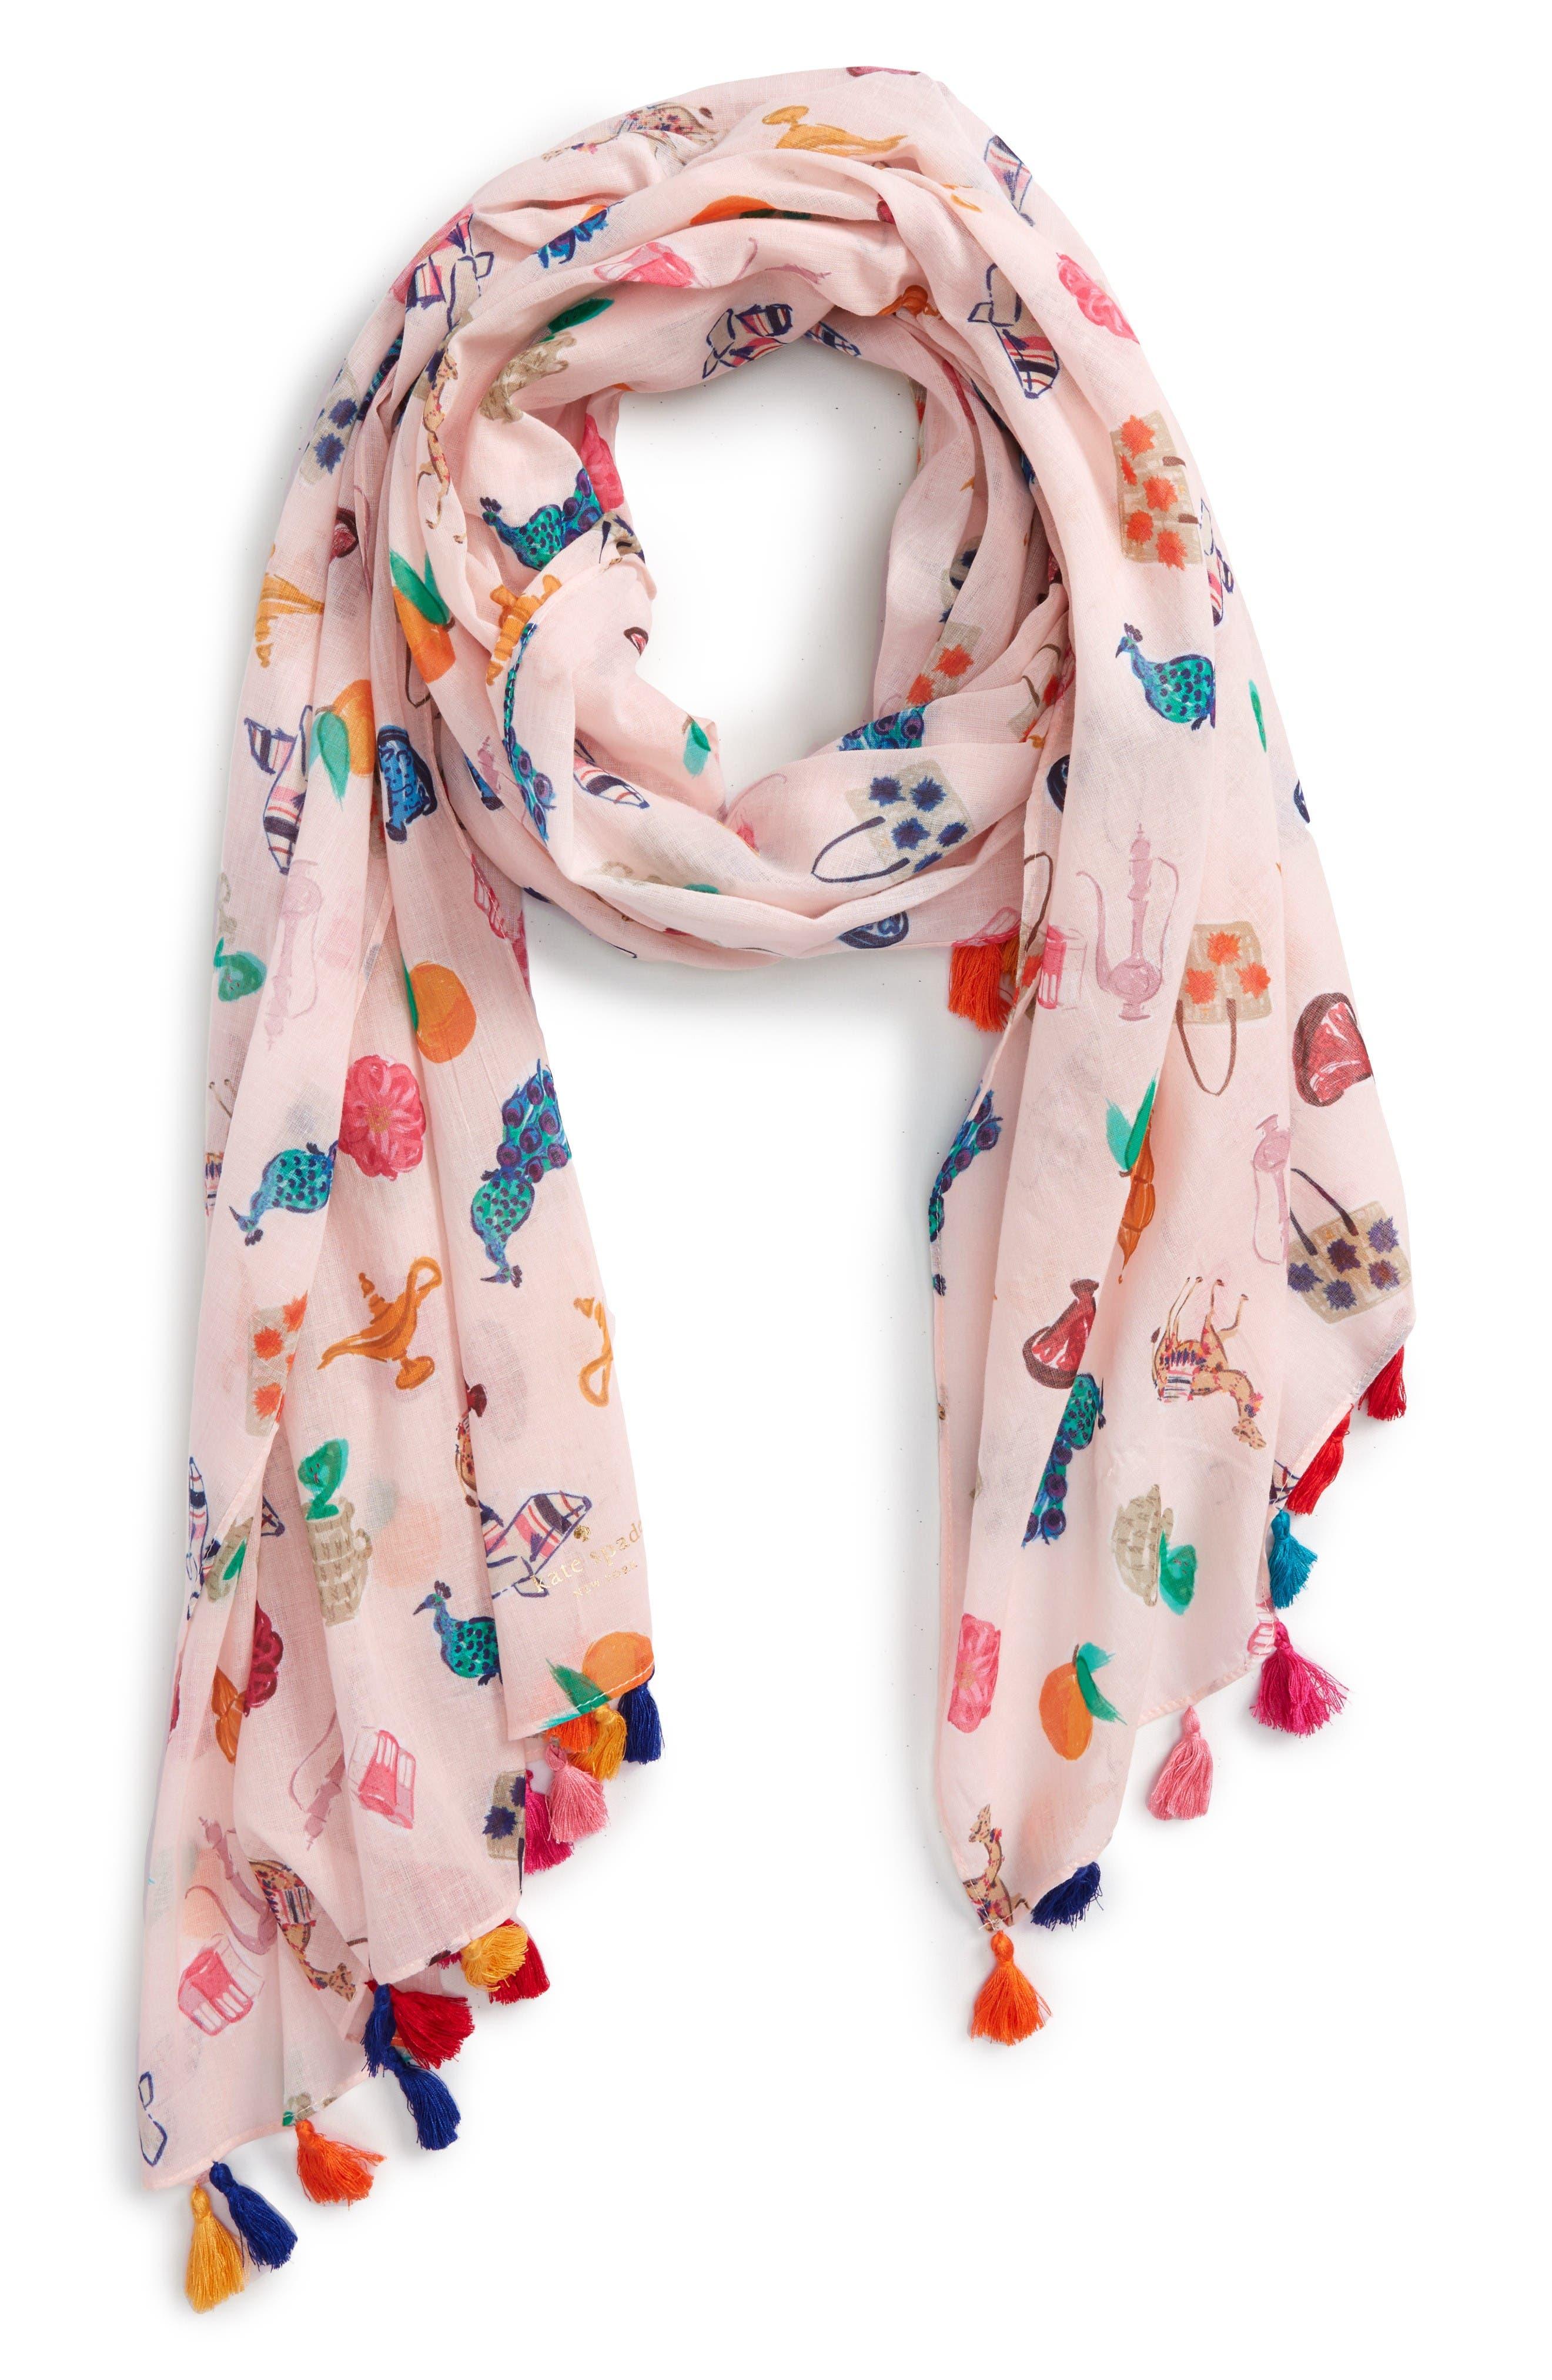 KATE SPADE NEW YORK souk tassel scarf